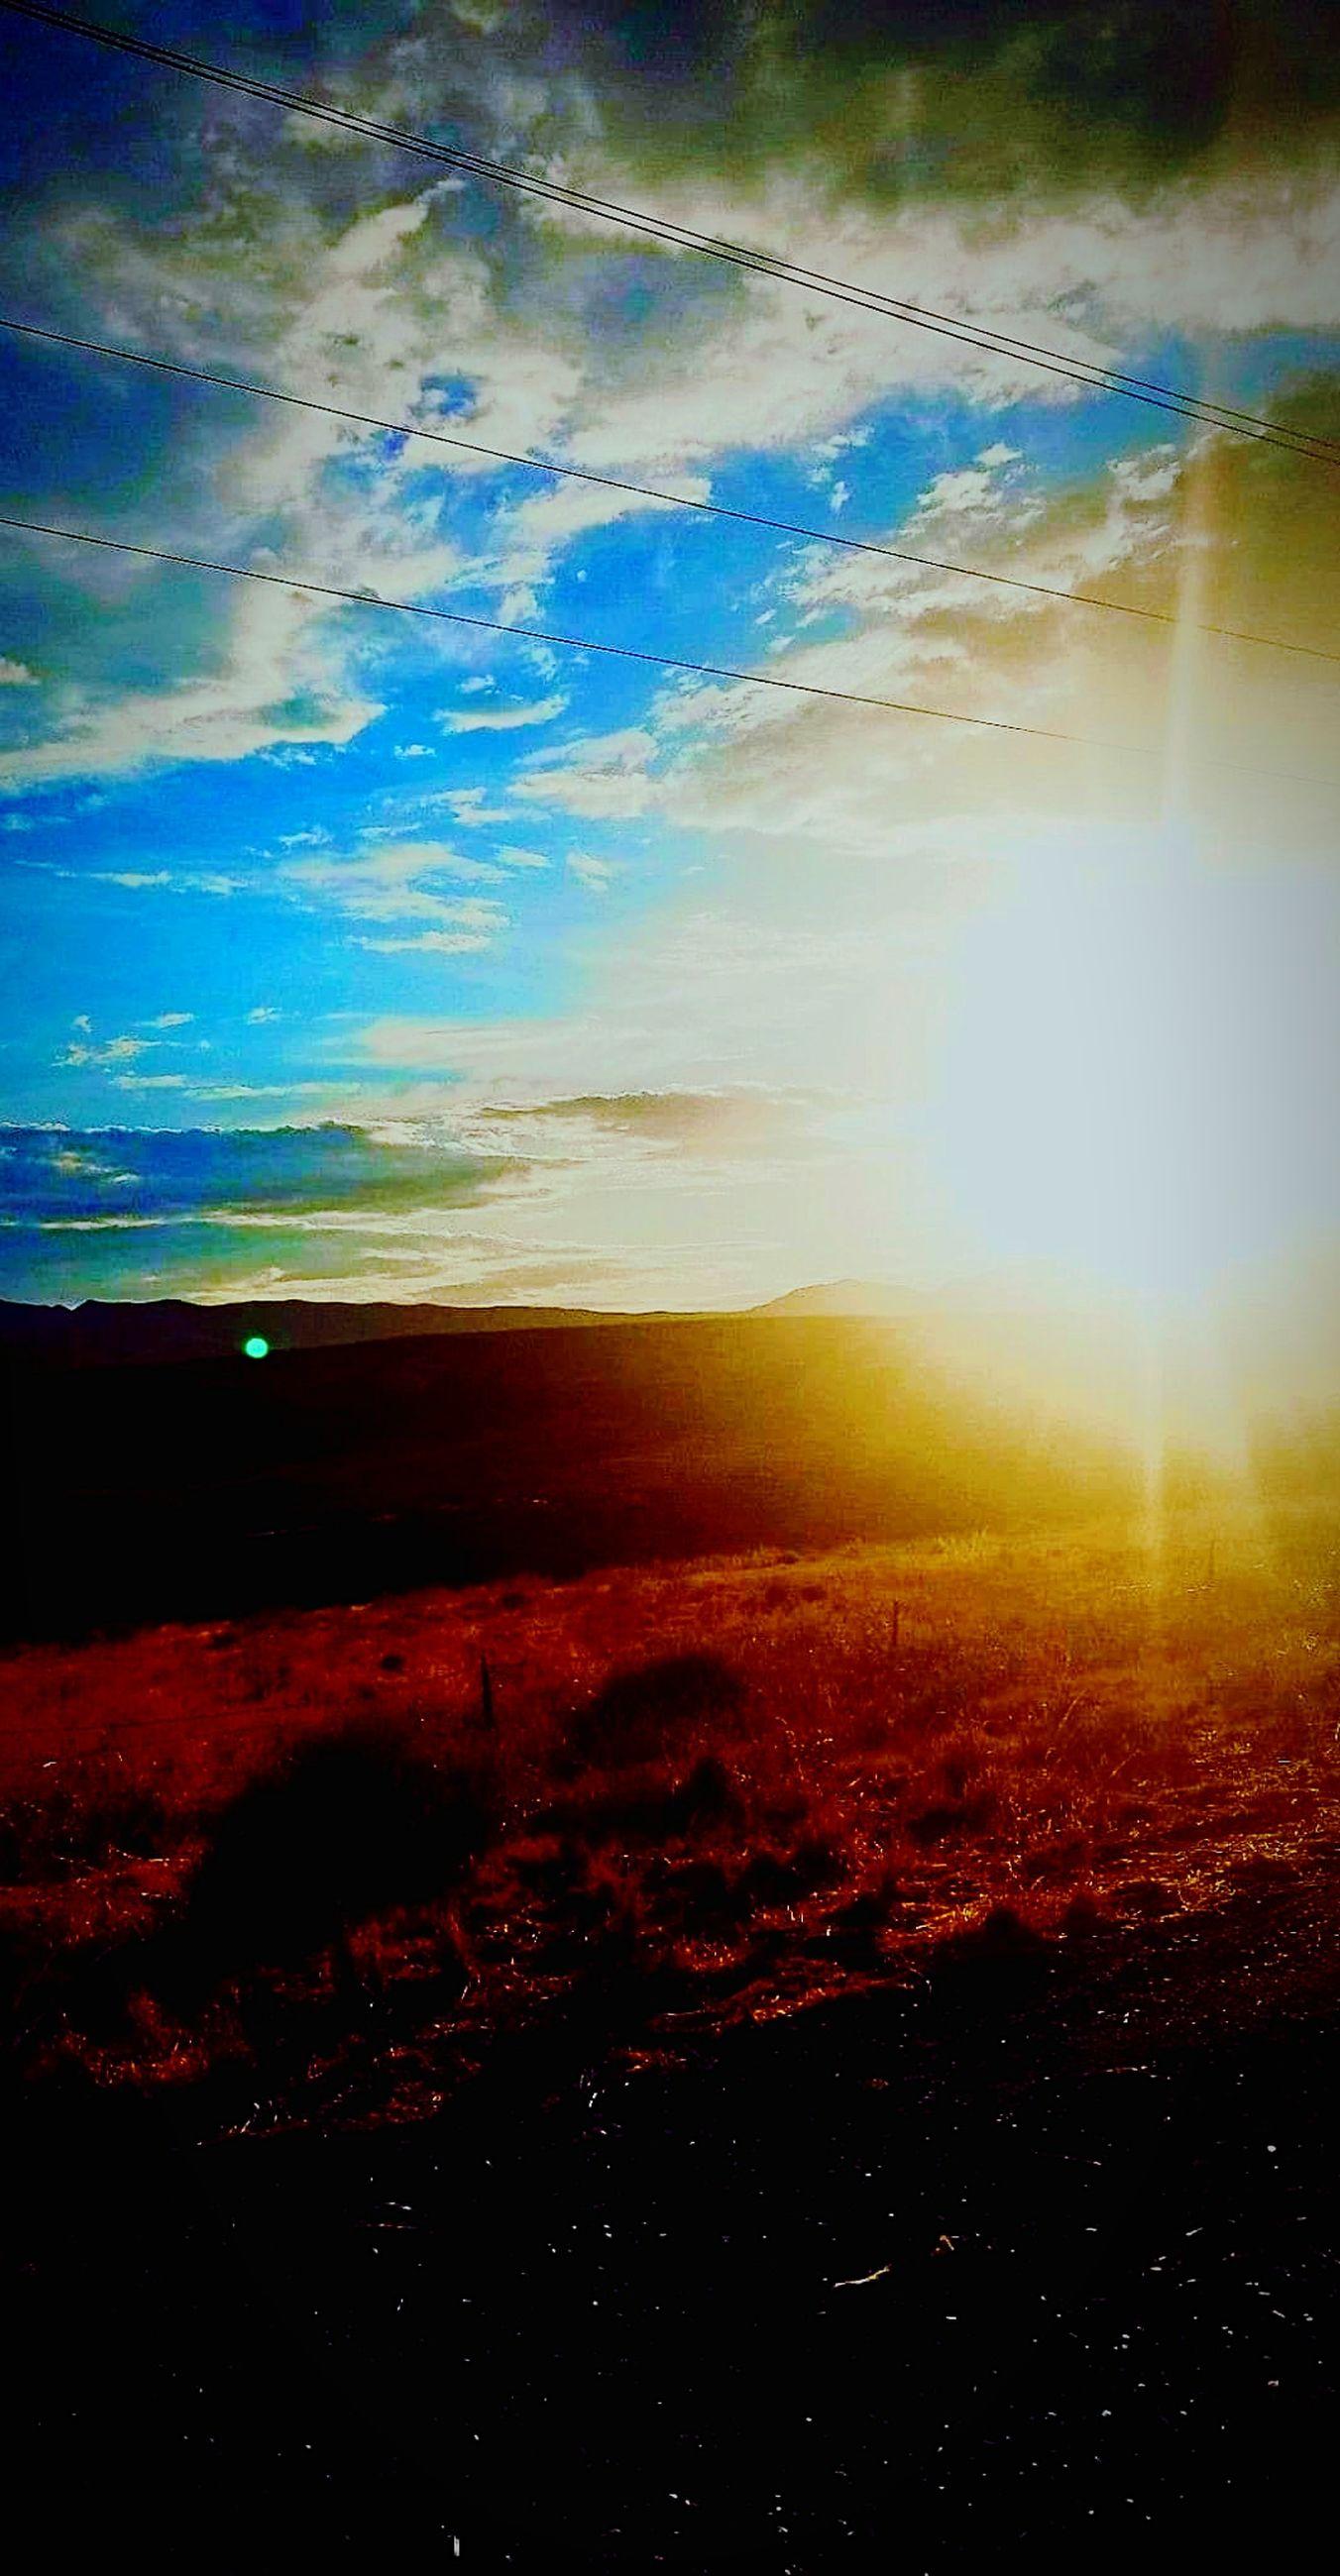 sky, cloud - sky, tranquil scene, scenics - nature, tranquility, environment, beauty in nature, landscape, nature, sun, no people, sunlight, sunset, outdoors, non-urban scene, idyllic, horizon, land, horizon over land, lens flare